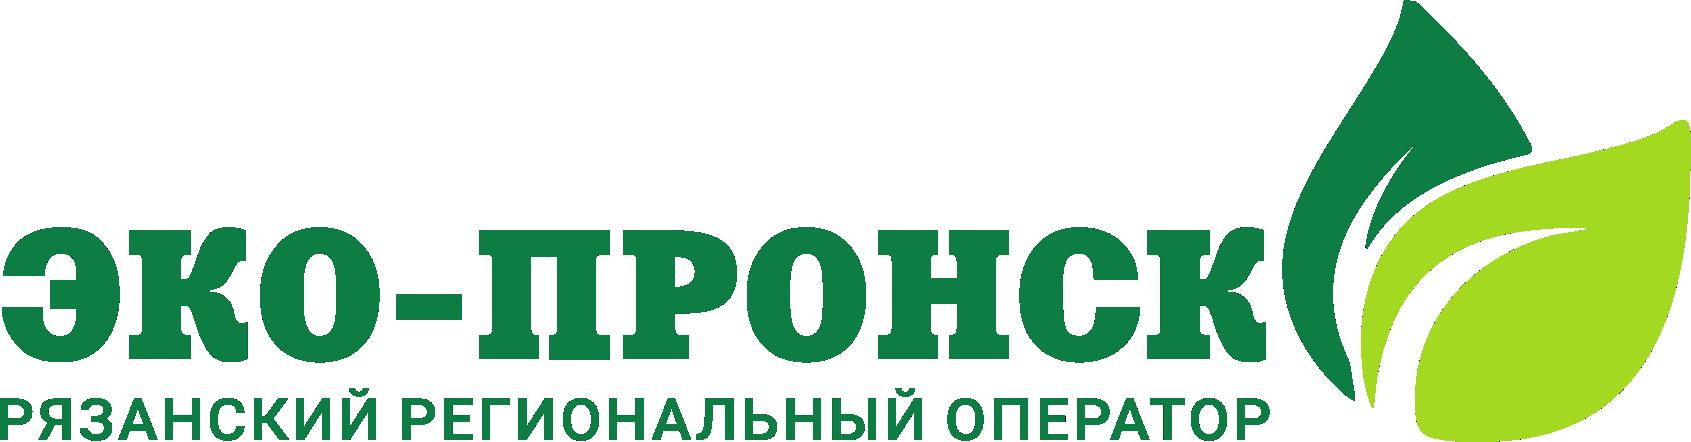 ООО Эко-Пронск